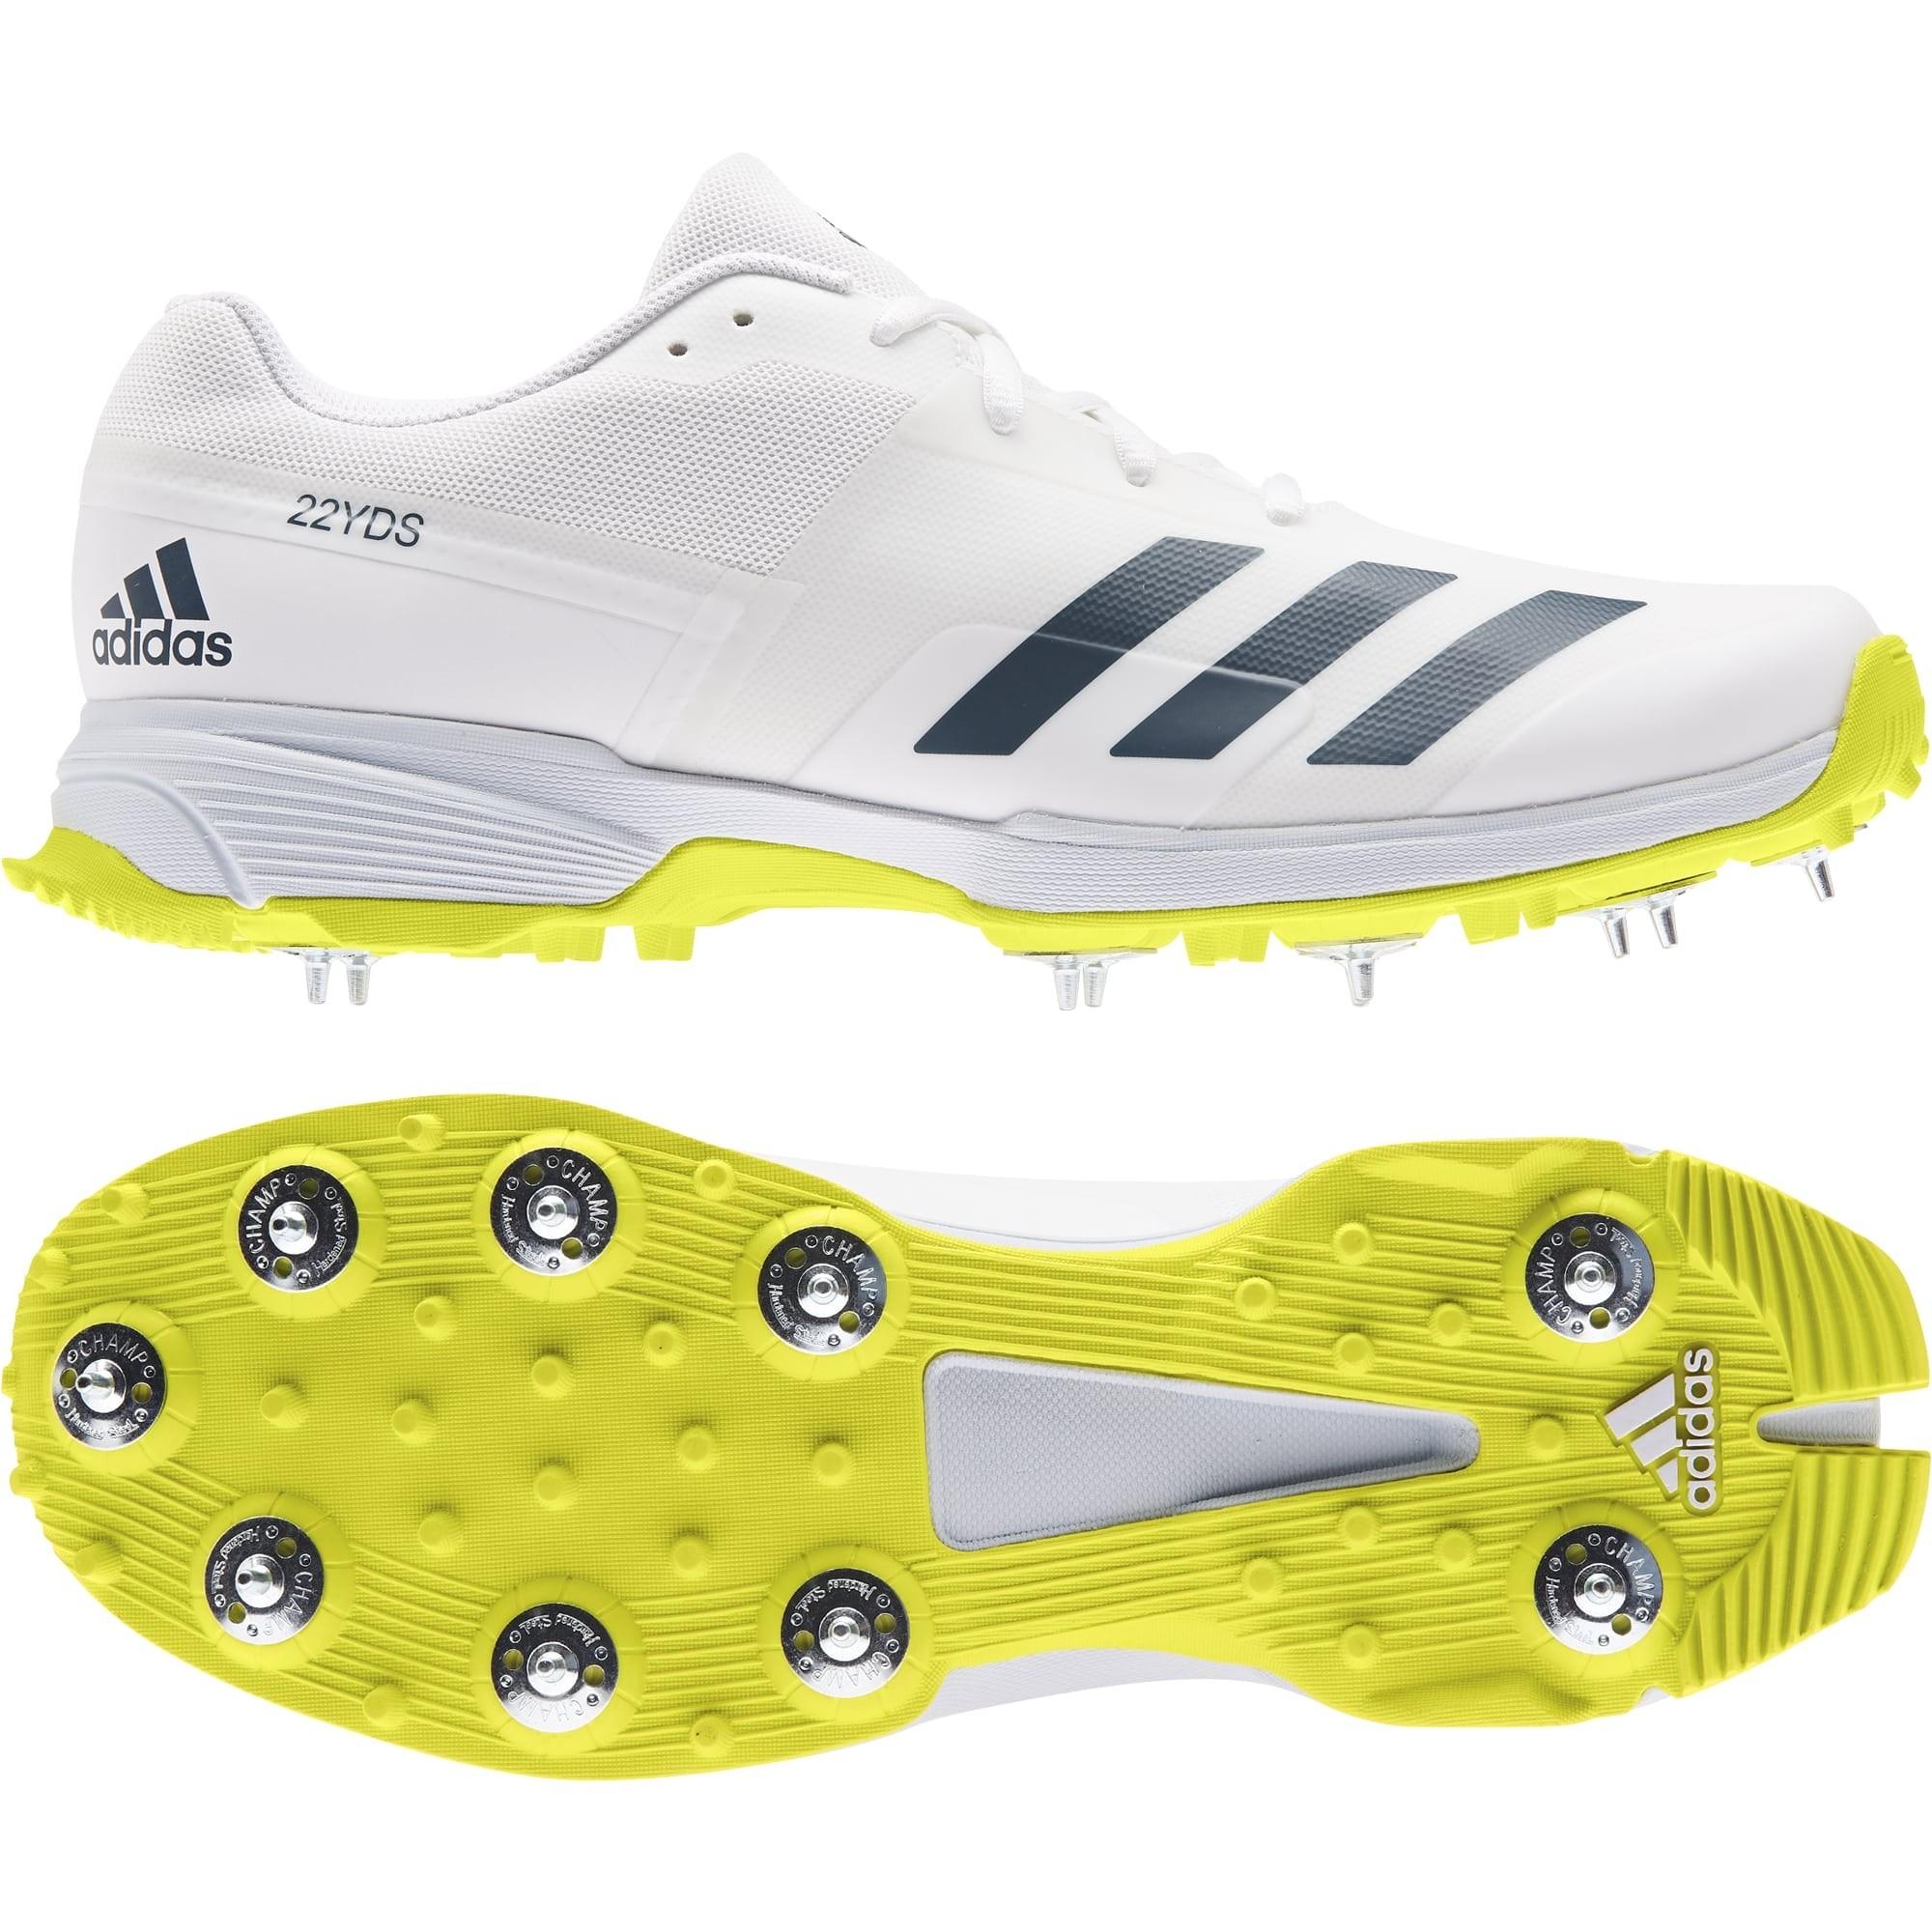 2021 Adidas 22YDS Full Spike II Cricket Shoes - Acid Yellow